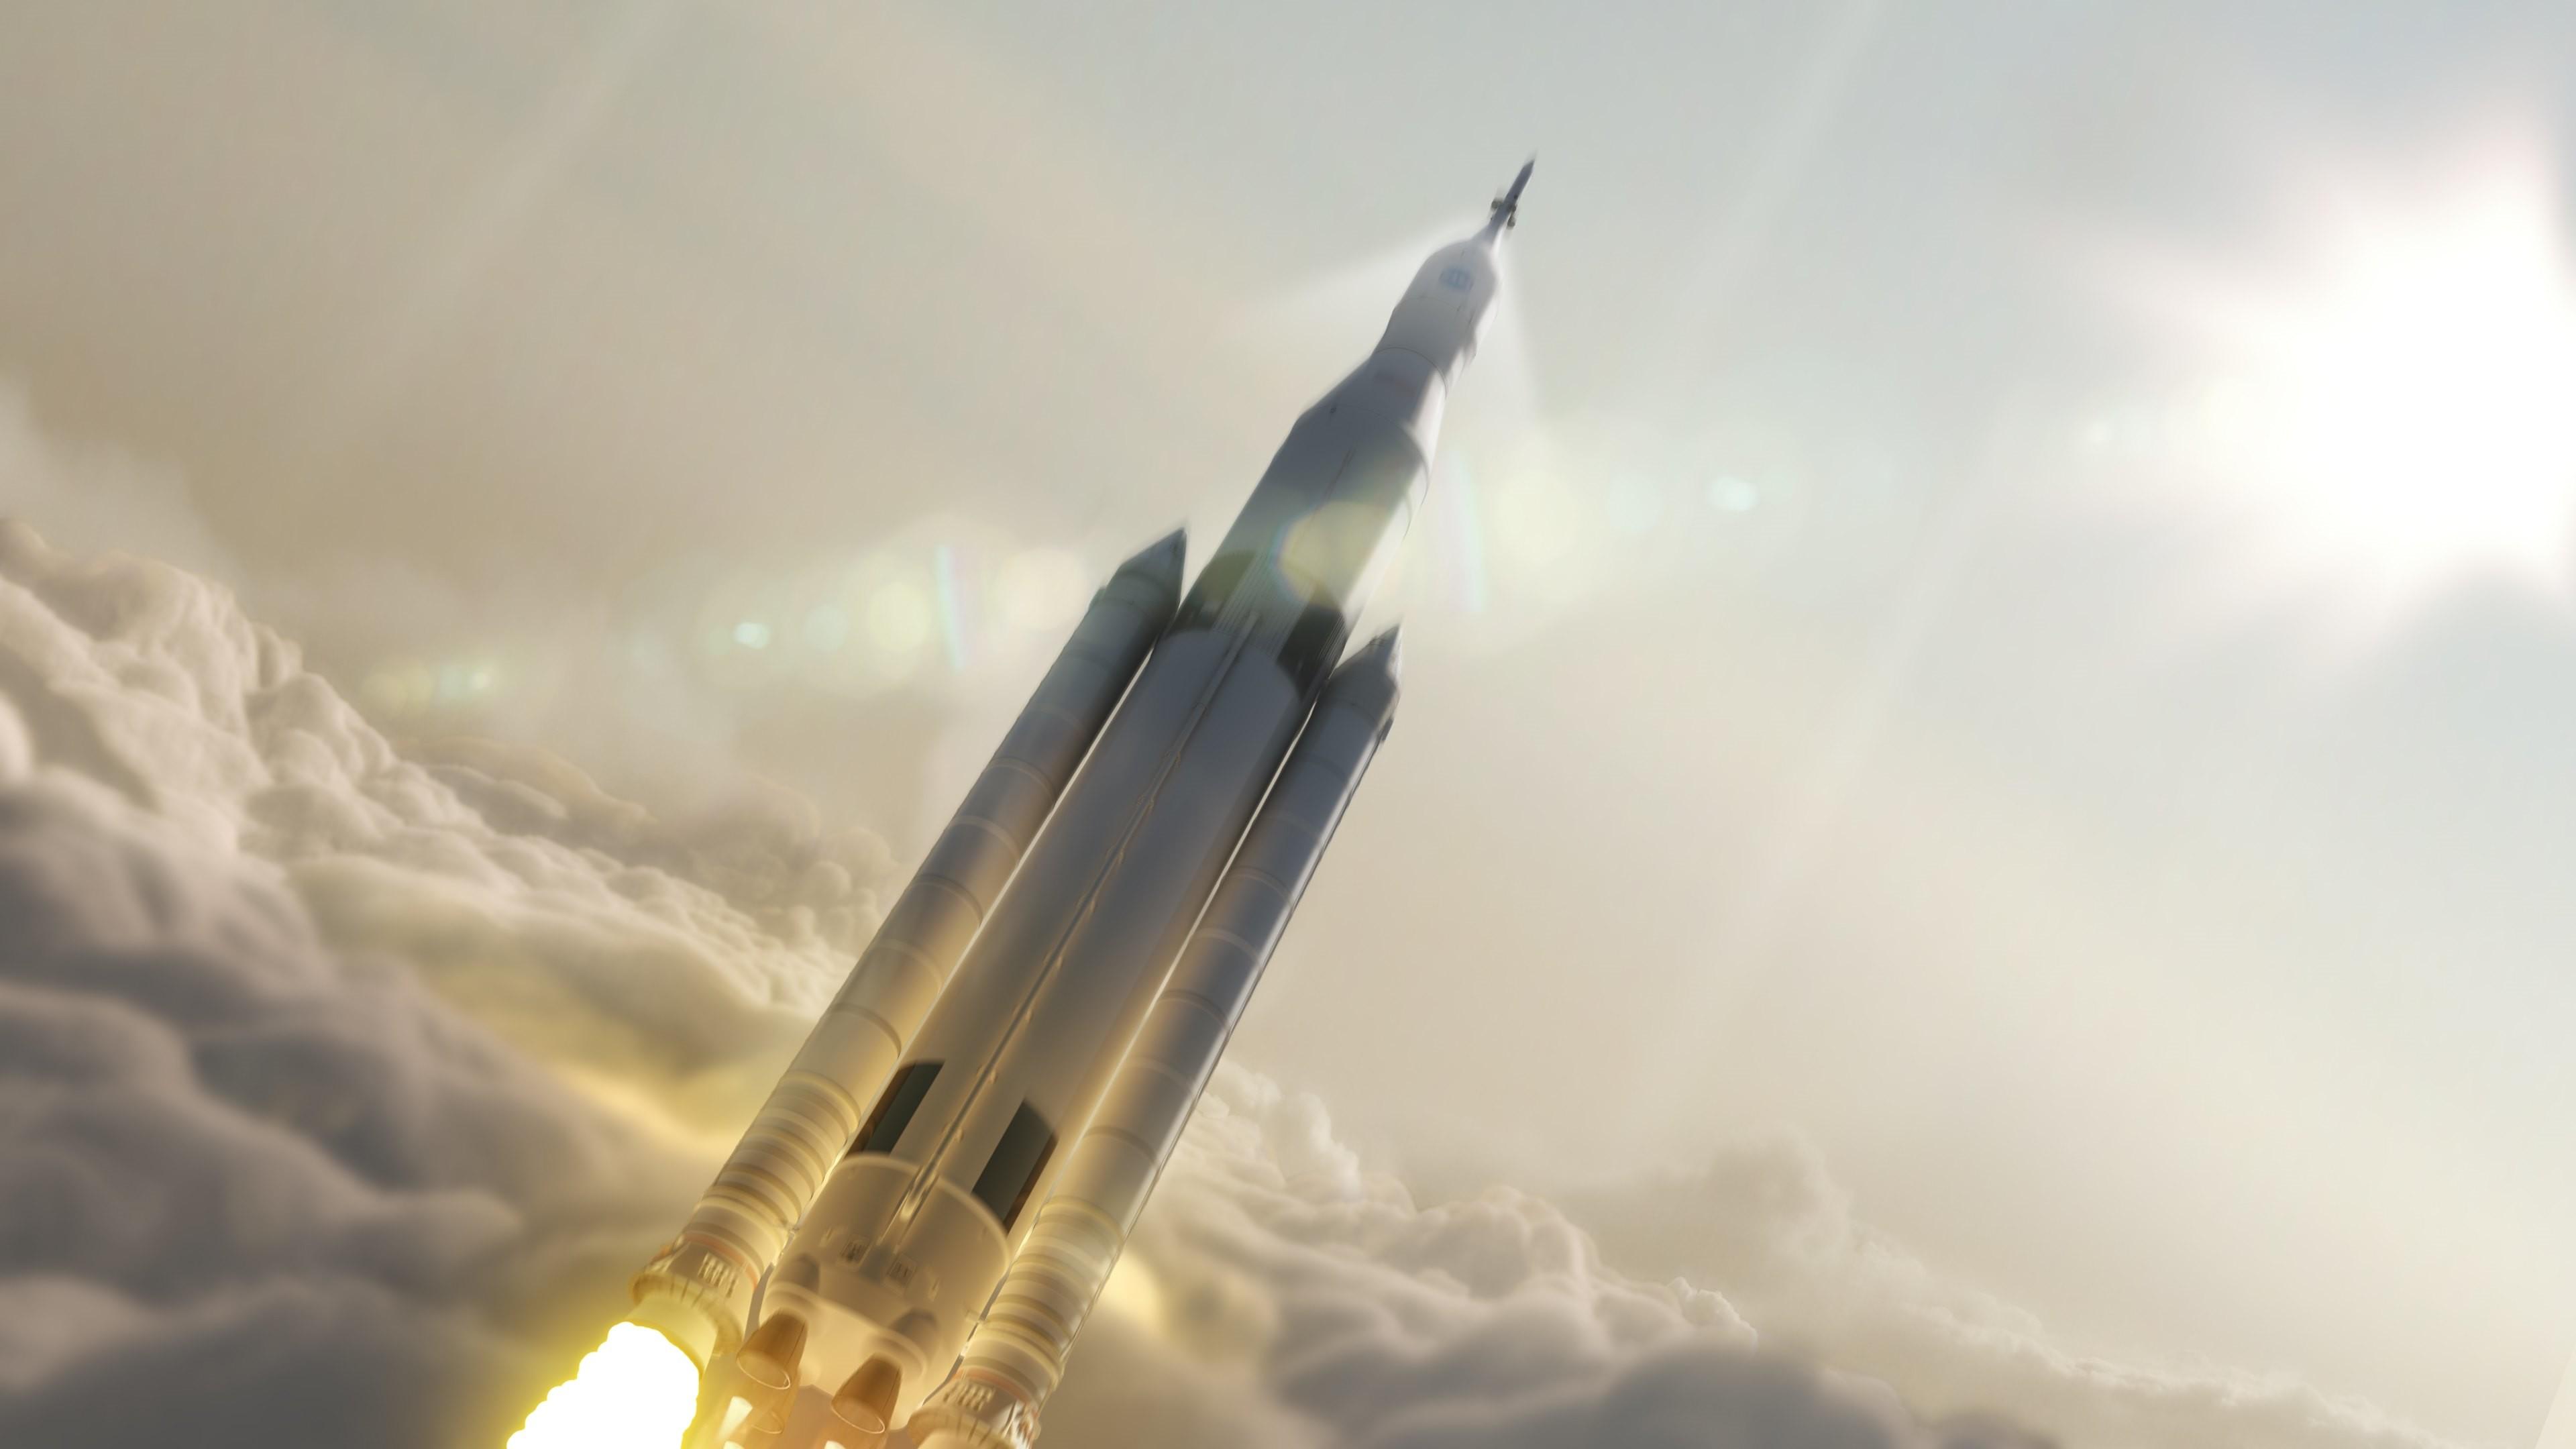 4K HD Wallpaper: NASA Space Launch System